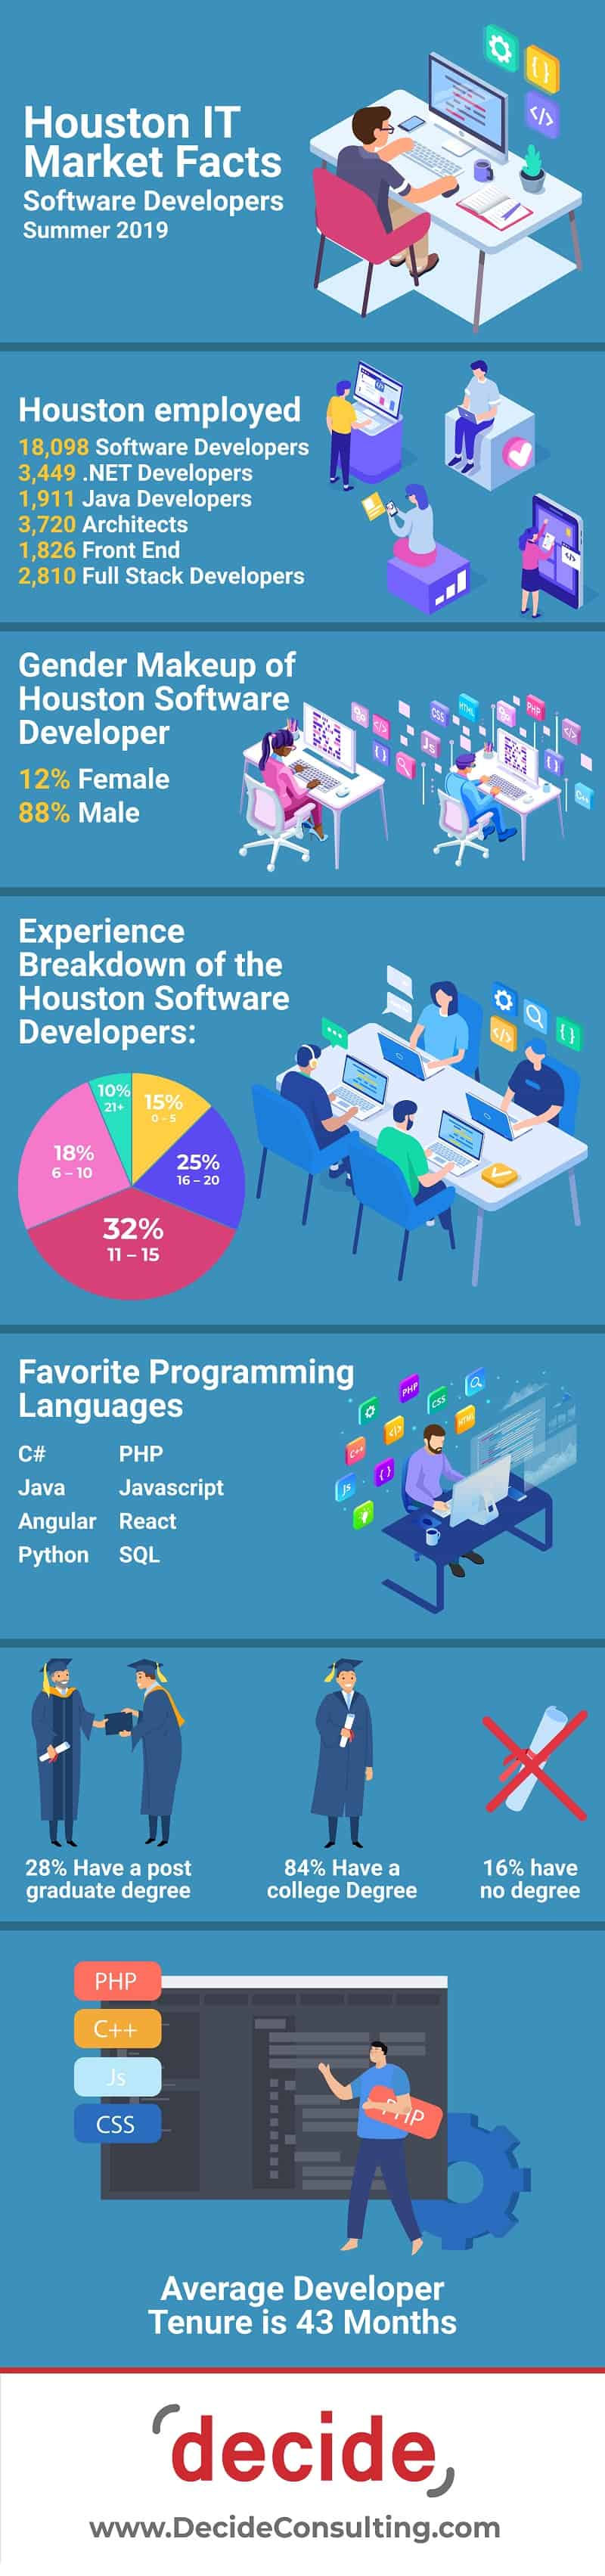 Infographic Houston IT Market Software Developers